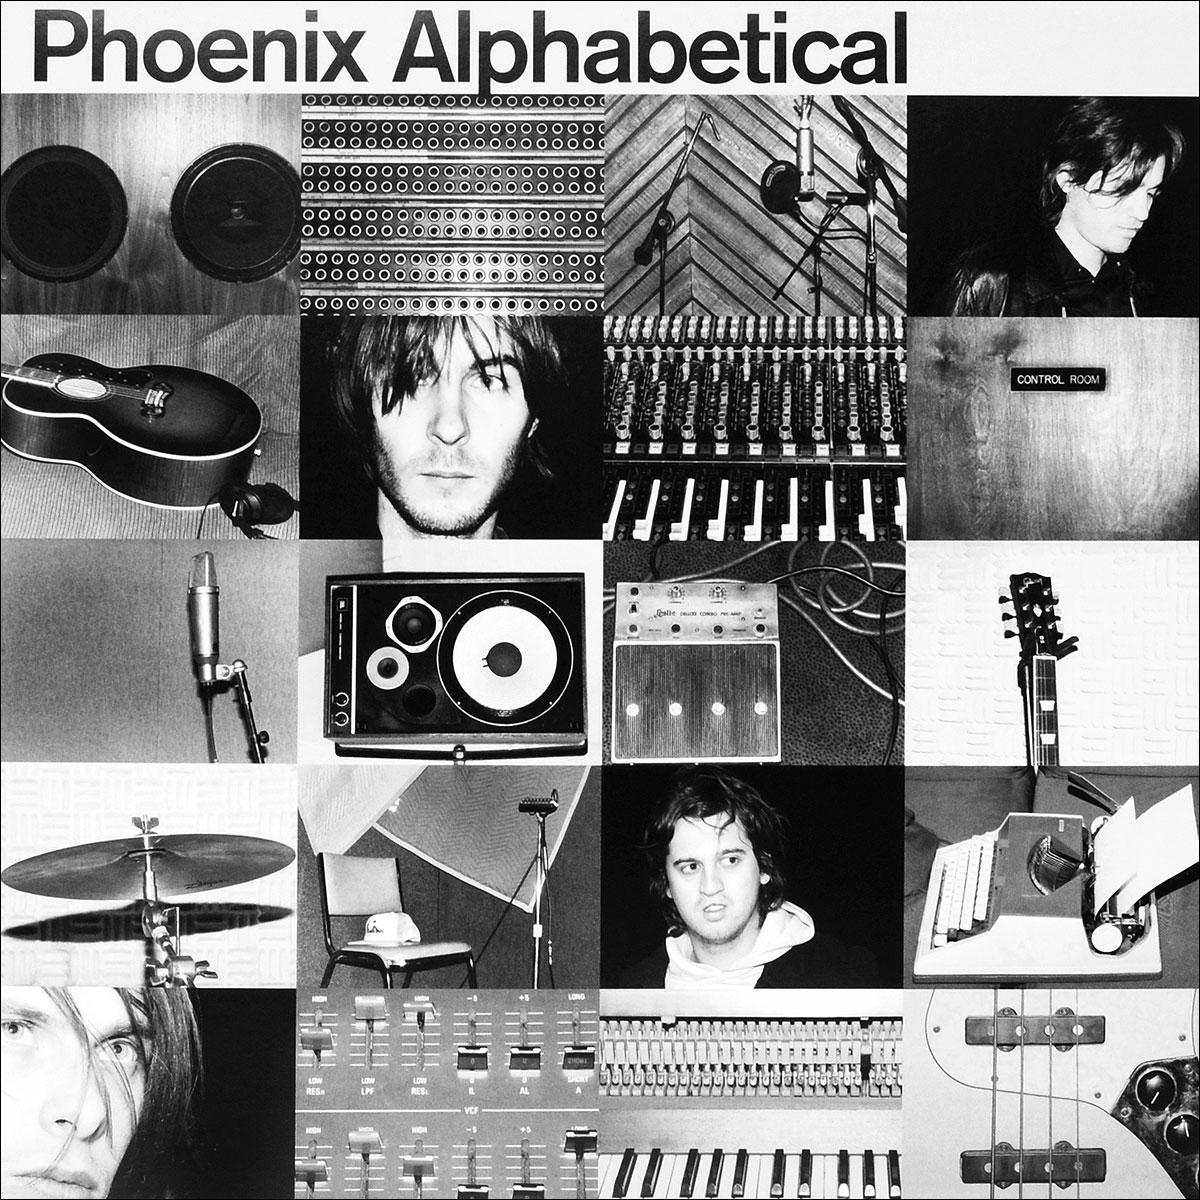 DJ Phoenix Phoenix. Alphabetical (LP) phoenix phoenix united alphabetical 2 lp